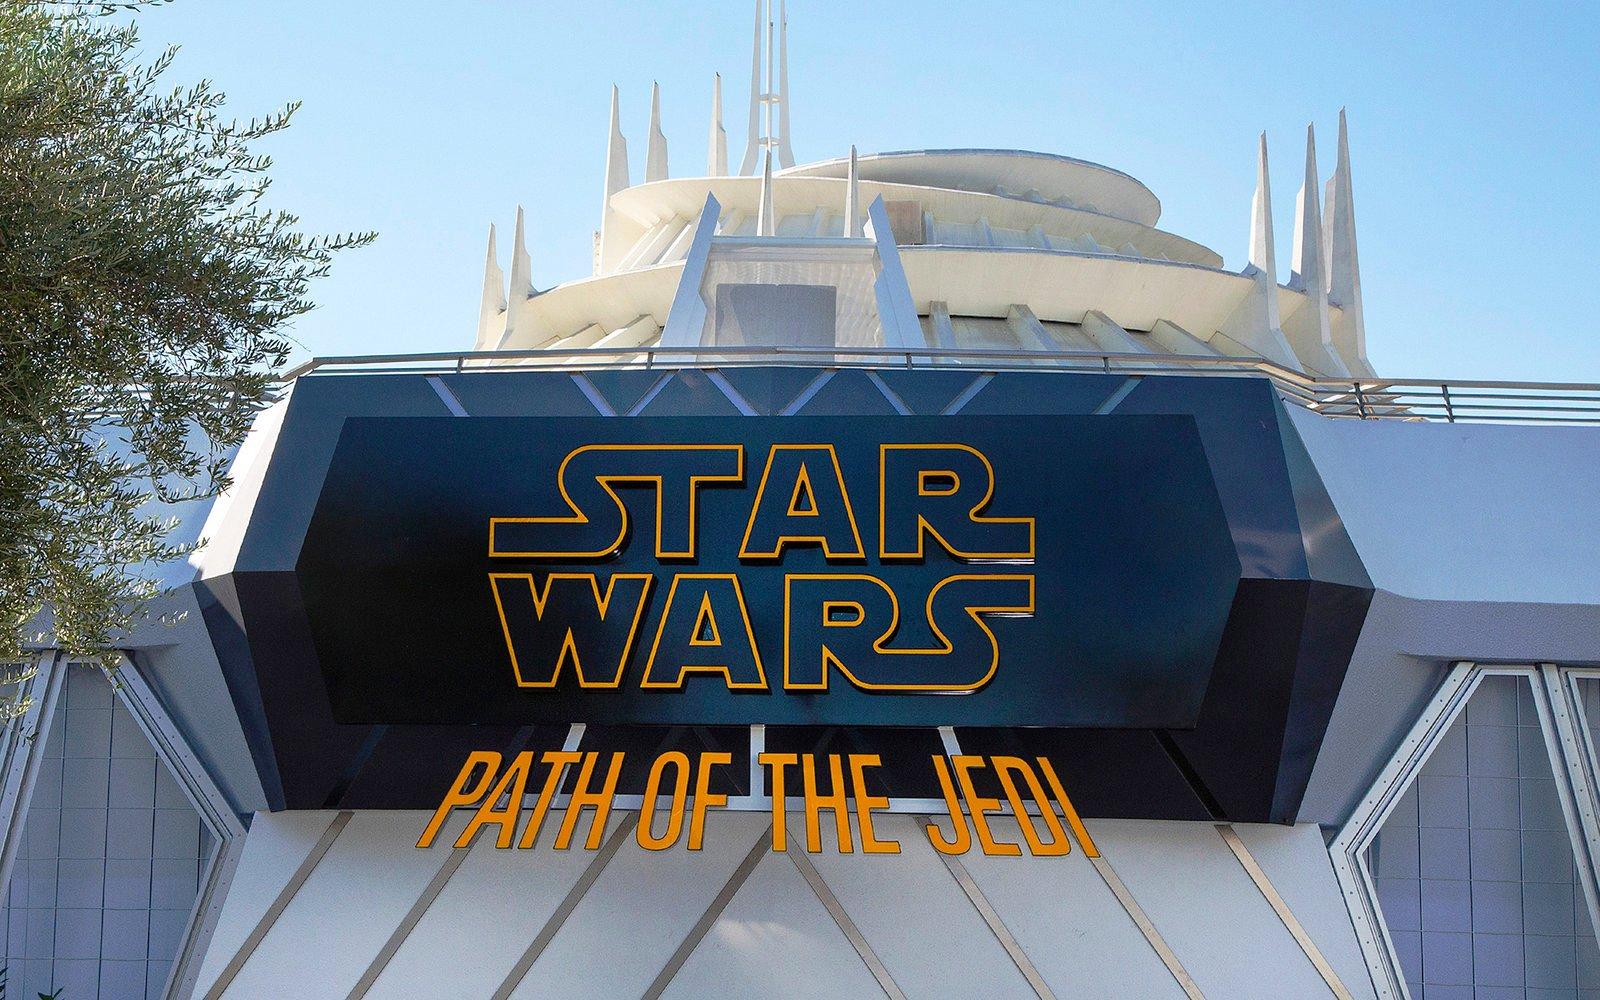 Star Wars: Path of the Jedi